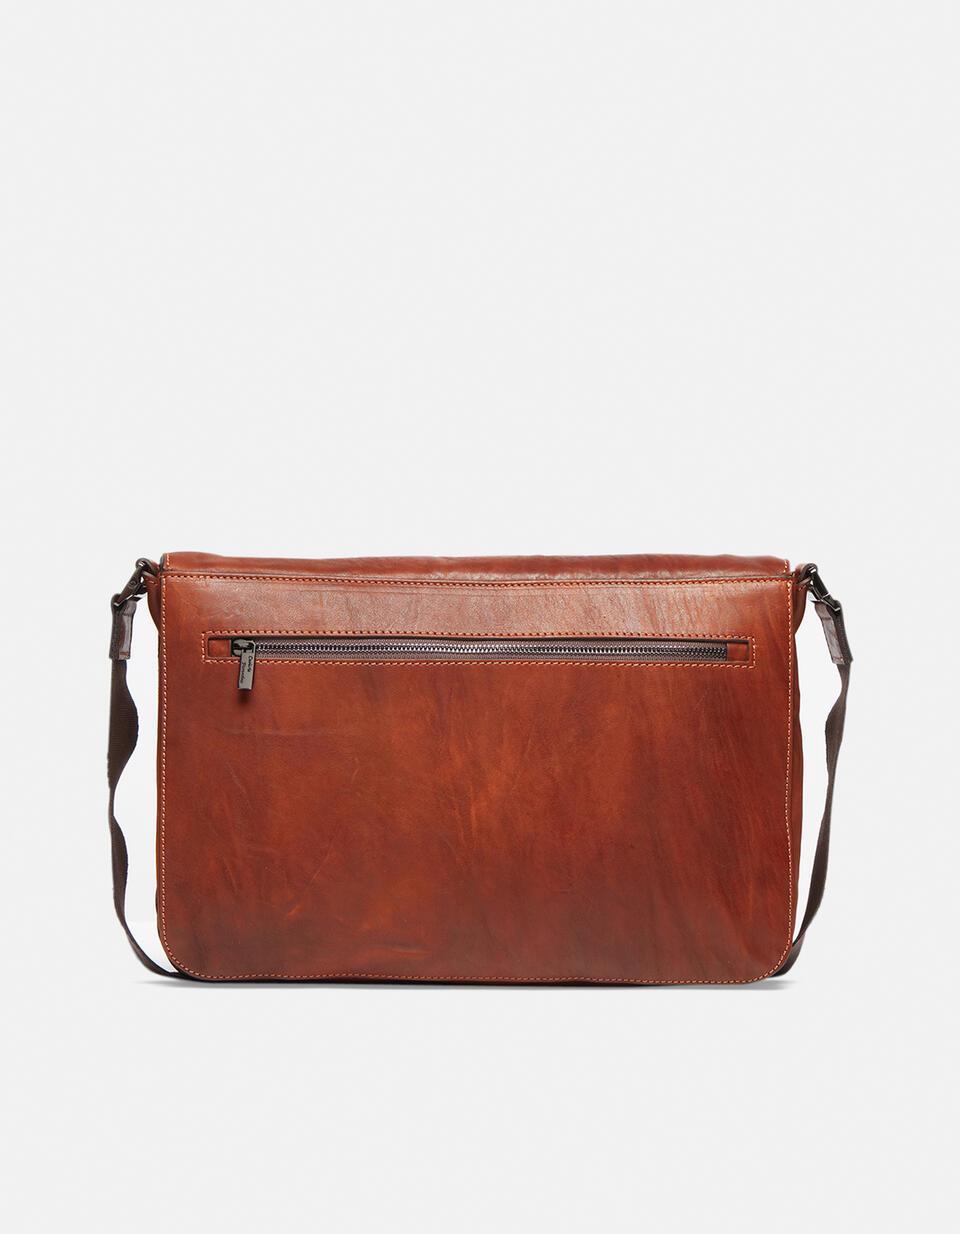 Bourbon leather large messenger bag in delavé leather MARRONE Cuoieria Fiorentina